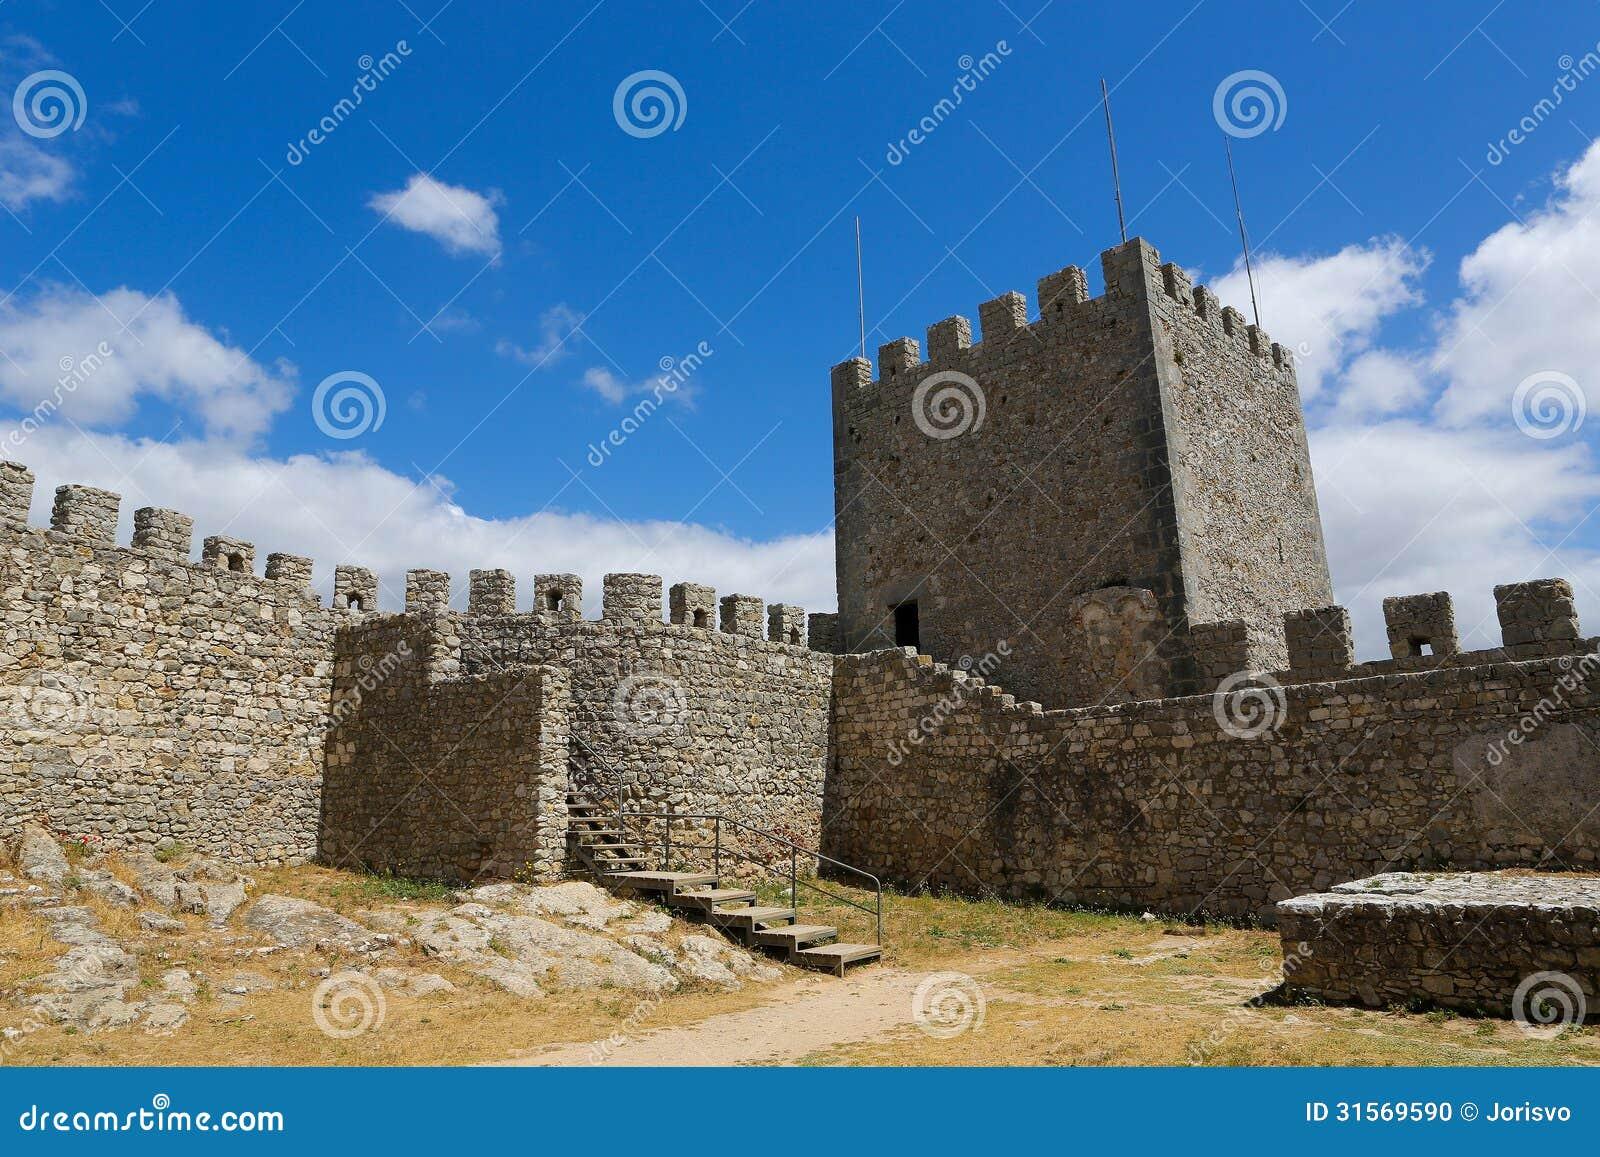 moorish castle stock photos - photo #26